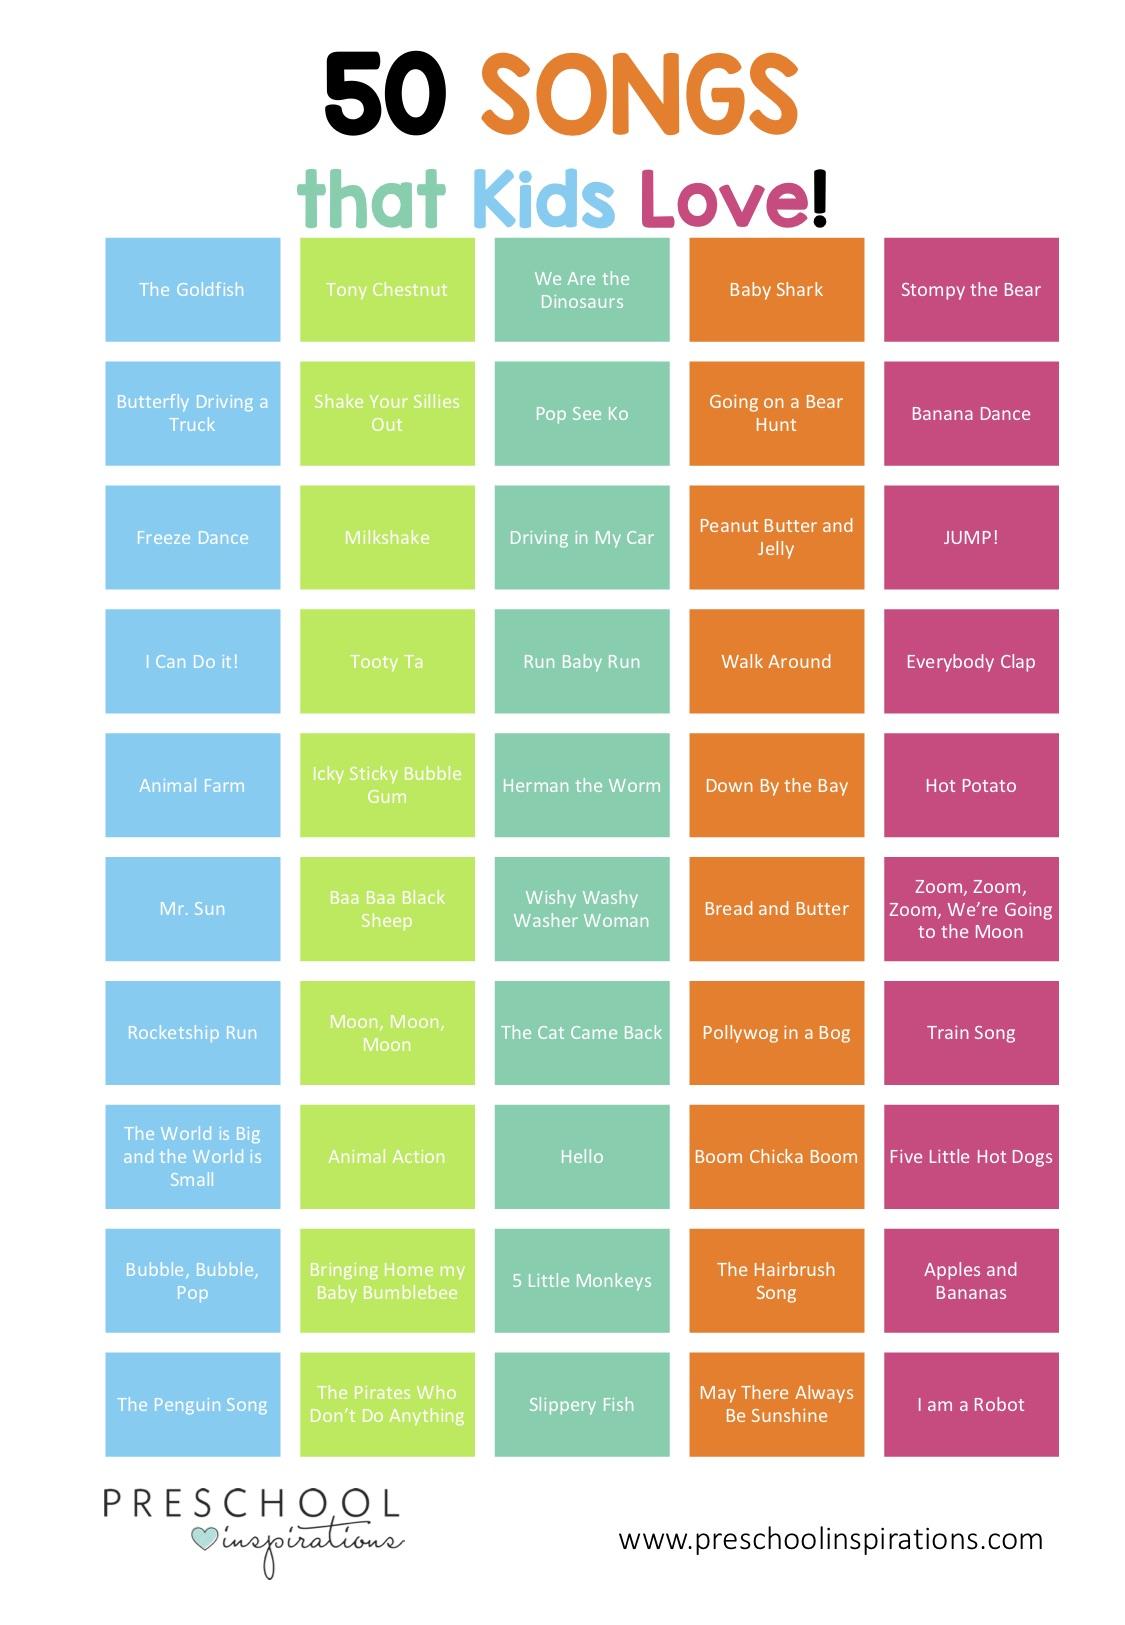 Titles of 50 popular kids' songs written on colorful blocks